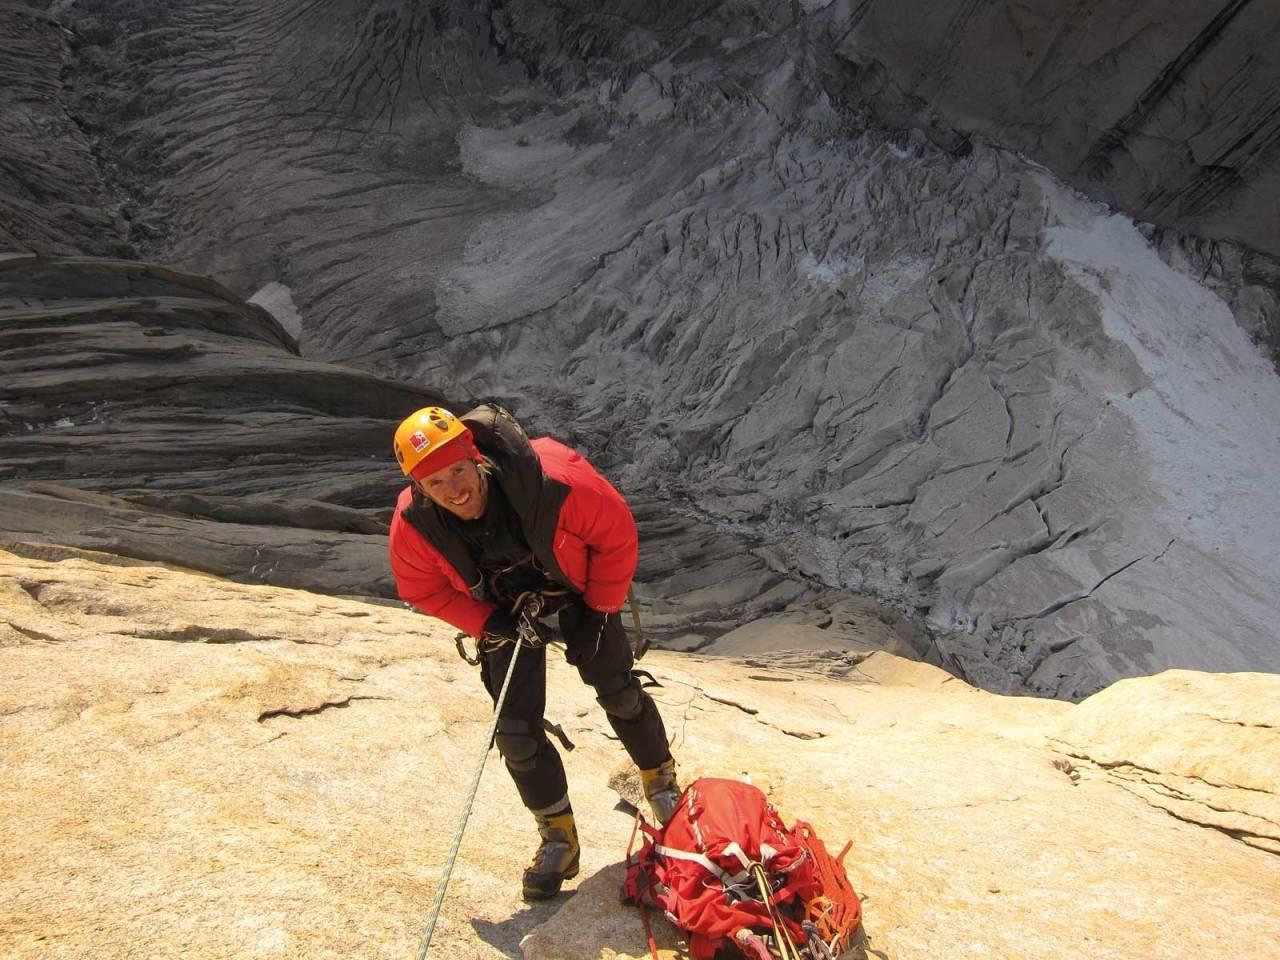 Ekspedisjon: Odd Roar på Nafes Cap i Pakistan. Foto: Henki Flatlandsmo